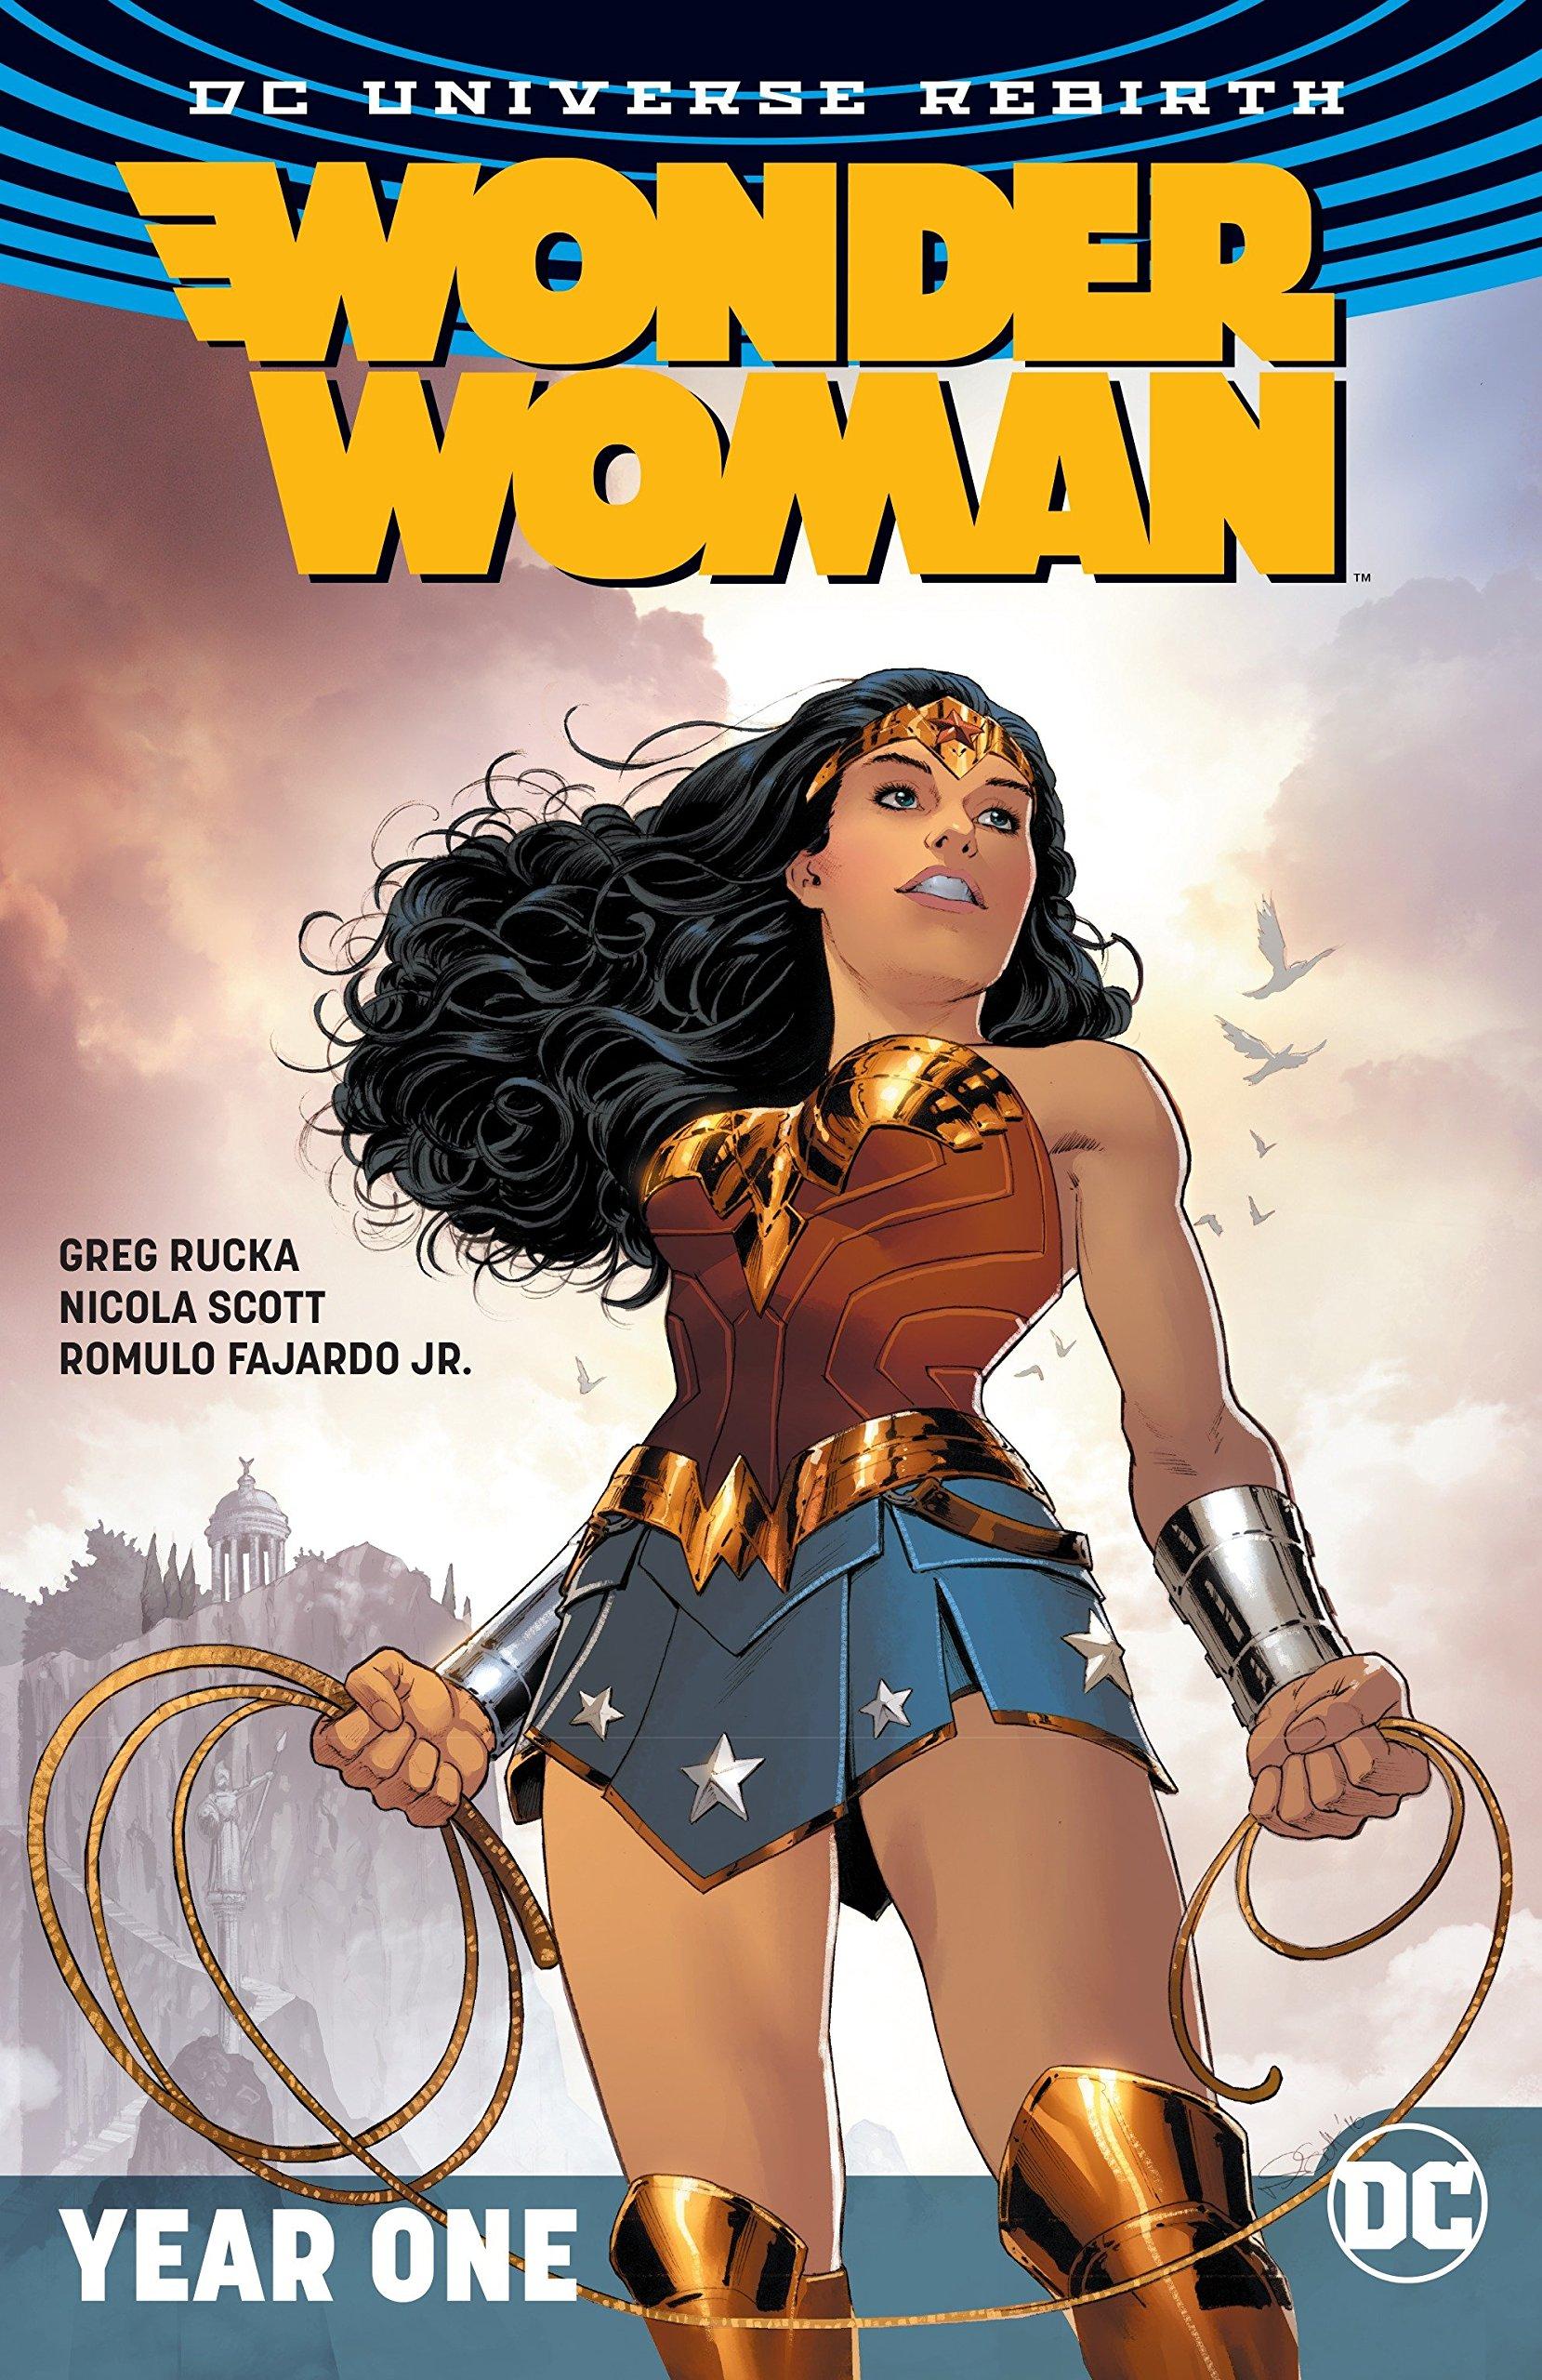 Wonder Woman Vol. 2: Year One (Rebirth) (Wonder Woman: DC Universe Rebirth, Band 2)